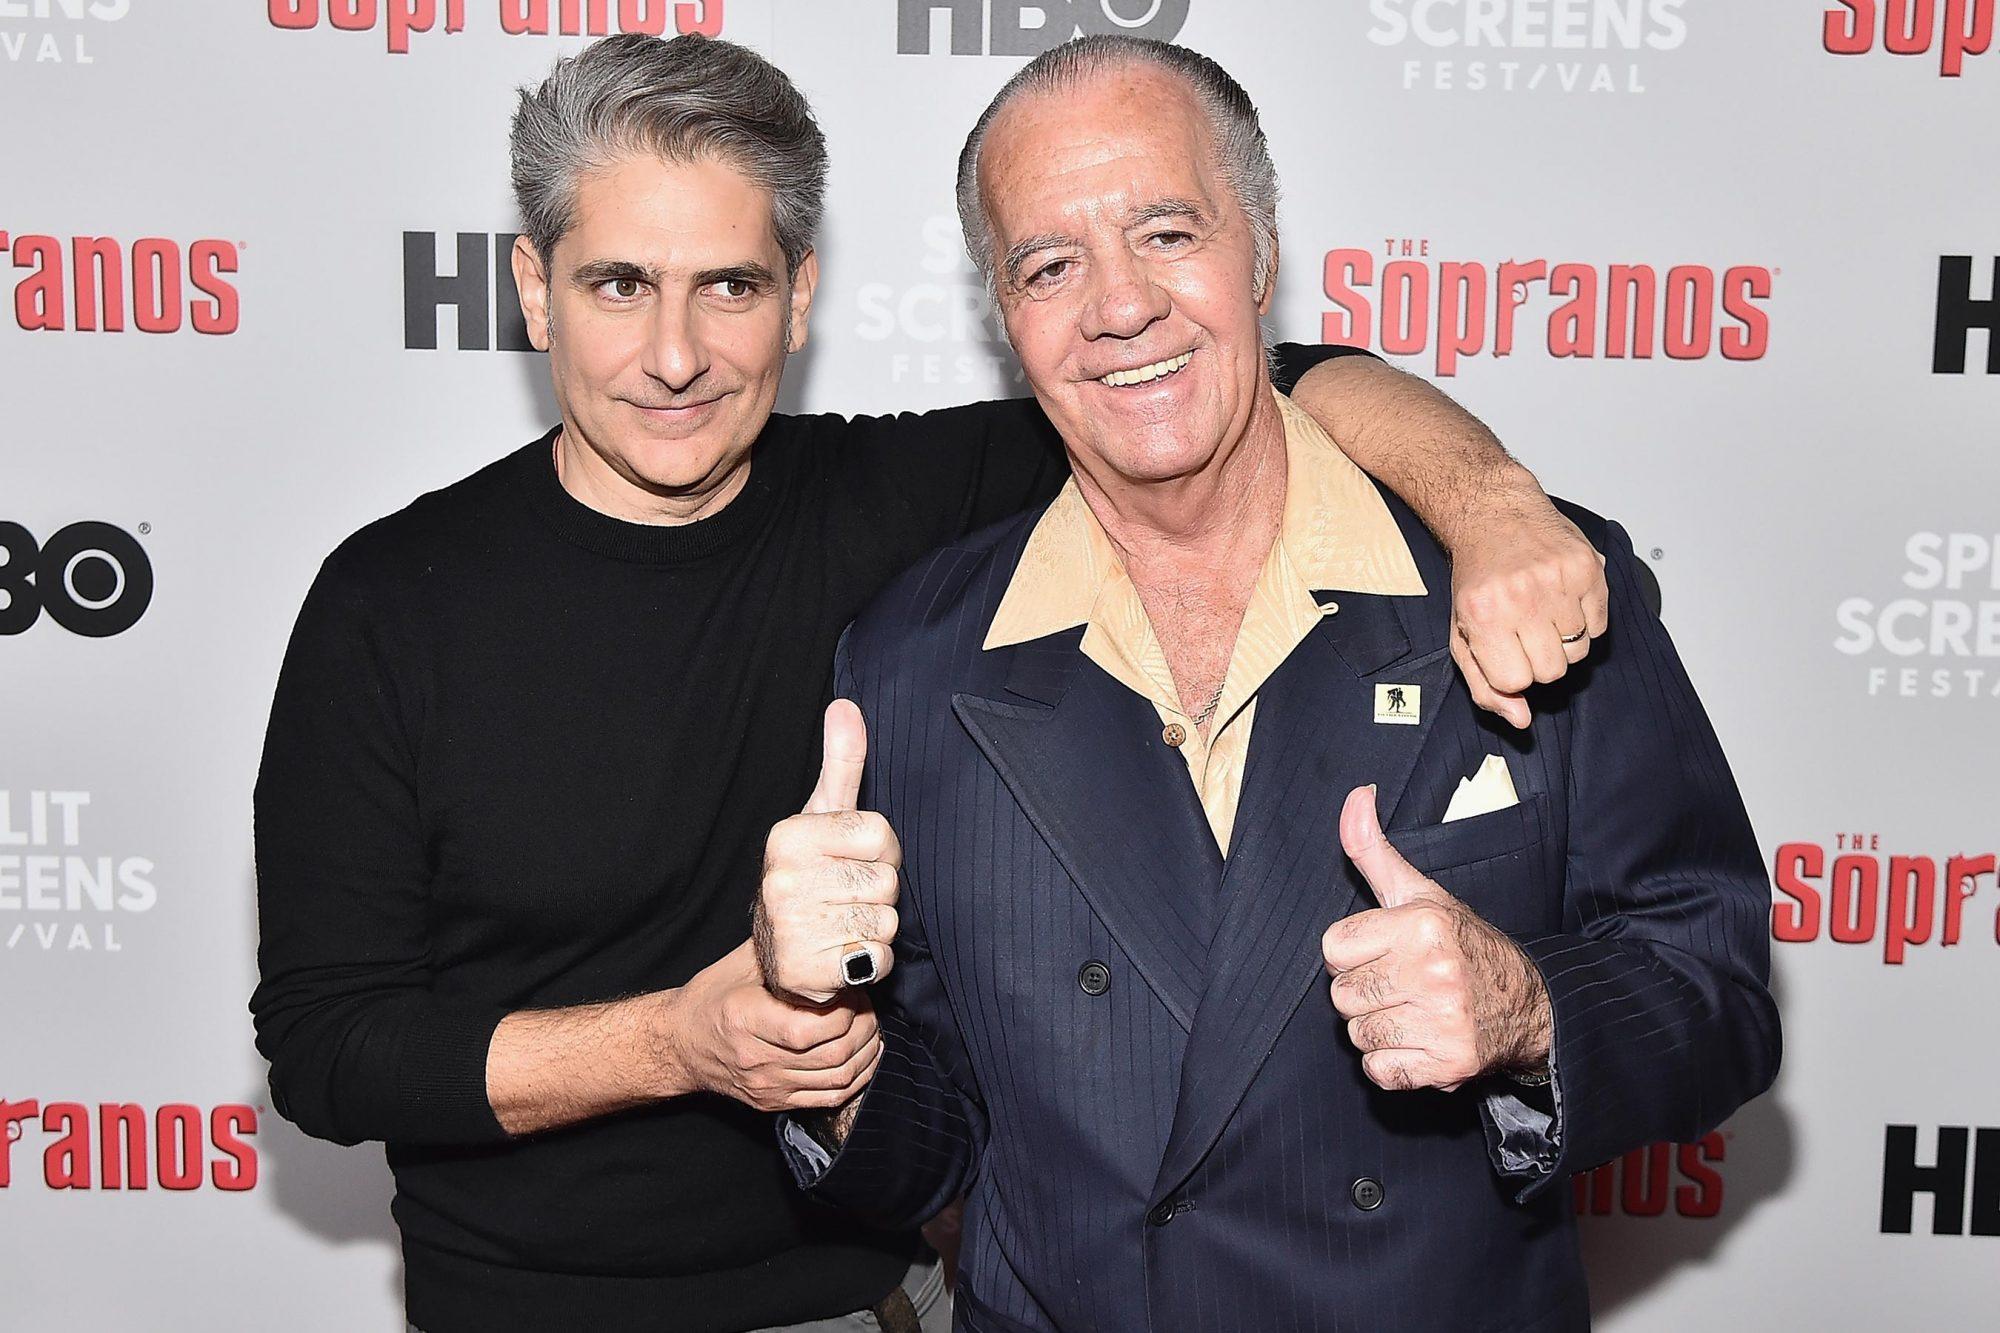 """The Sopranos"" 20th Anniversary Panel Discussion"